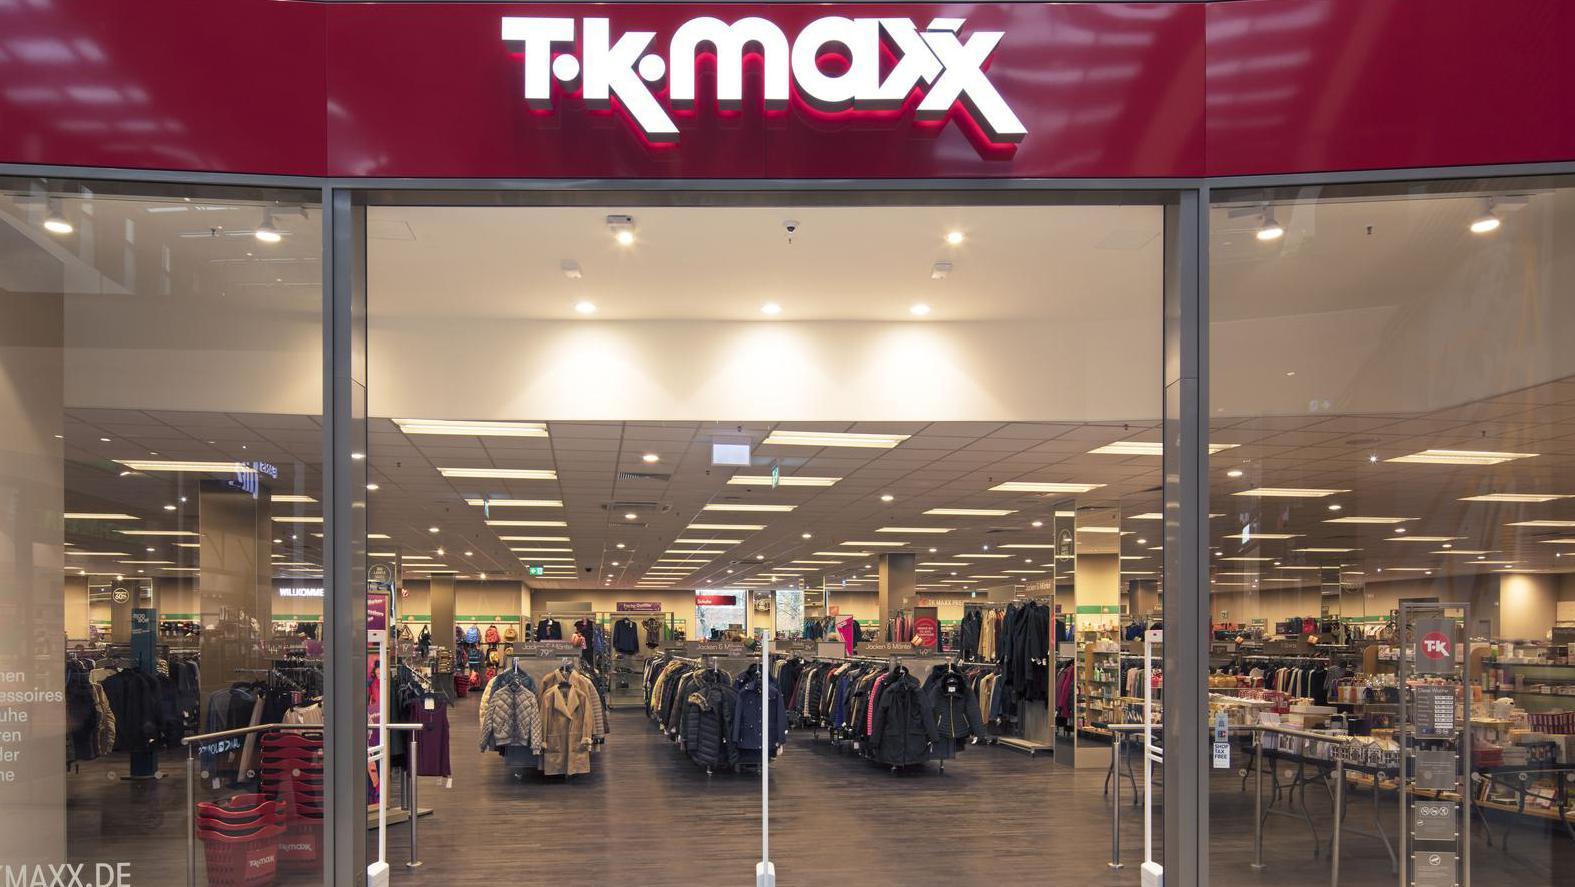 TK Maxx Emsgalerie Rheine YDyzz